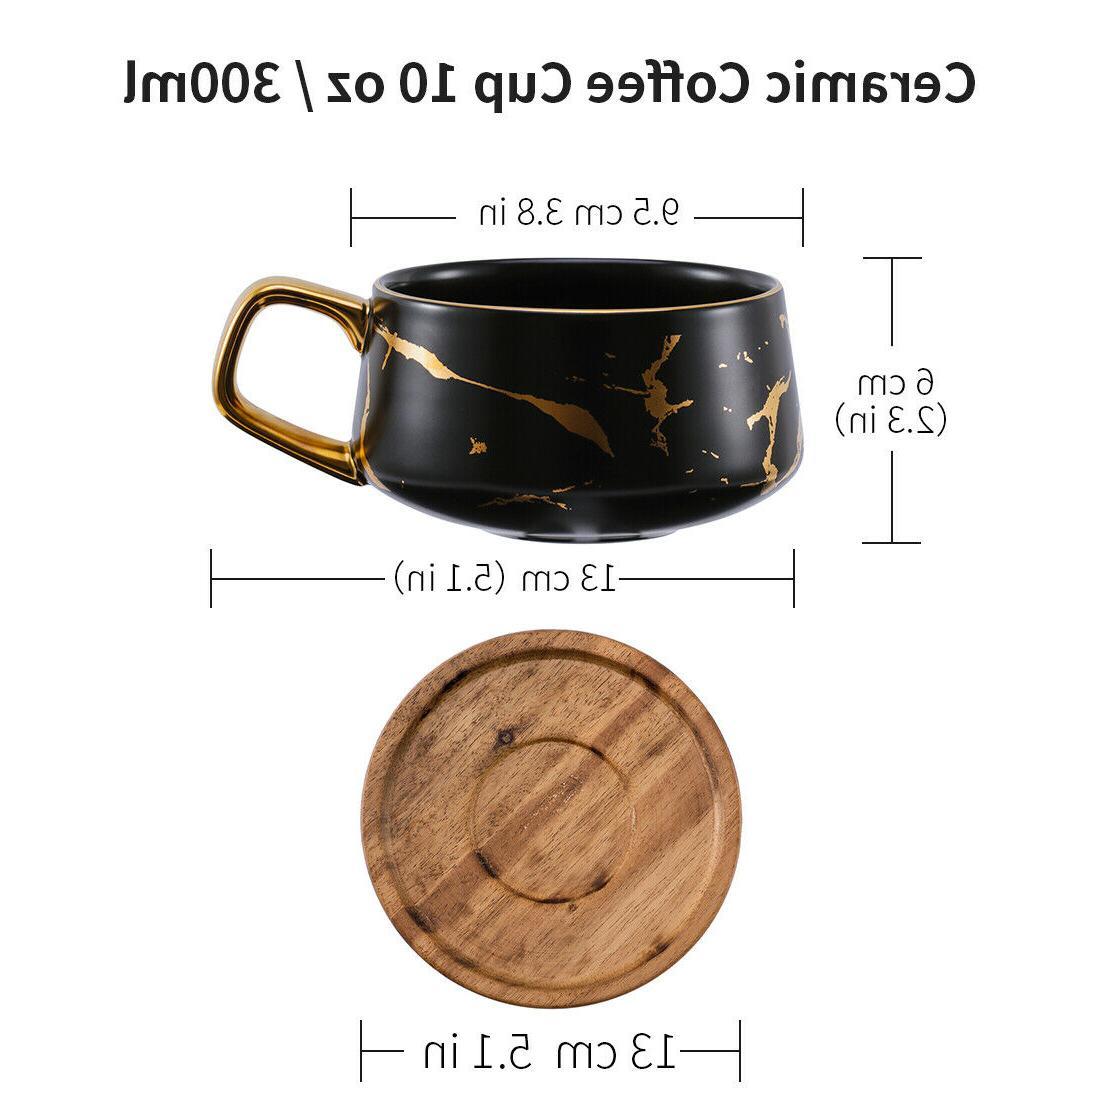 Tilany Cup Wooden - Coffee Mug, oz